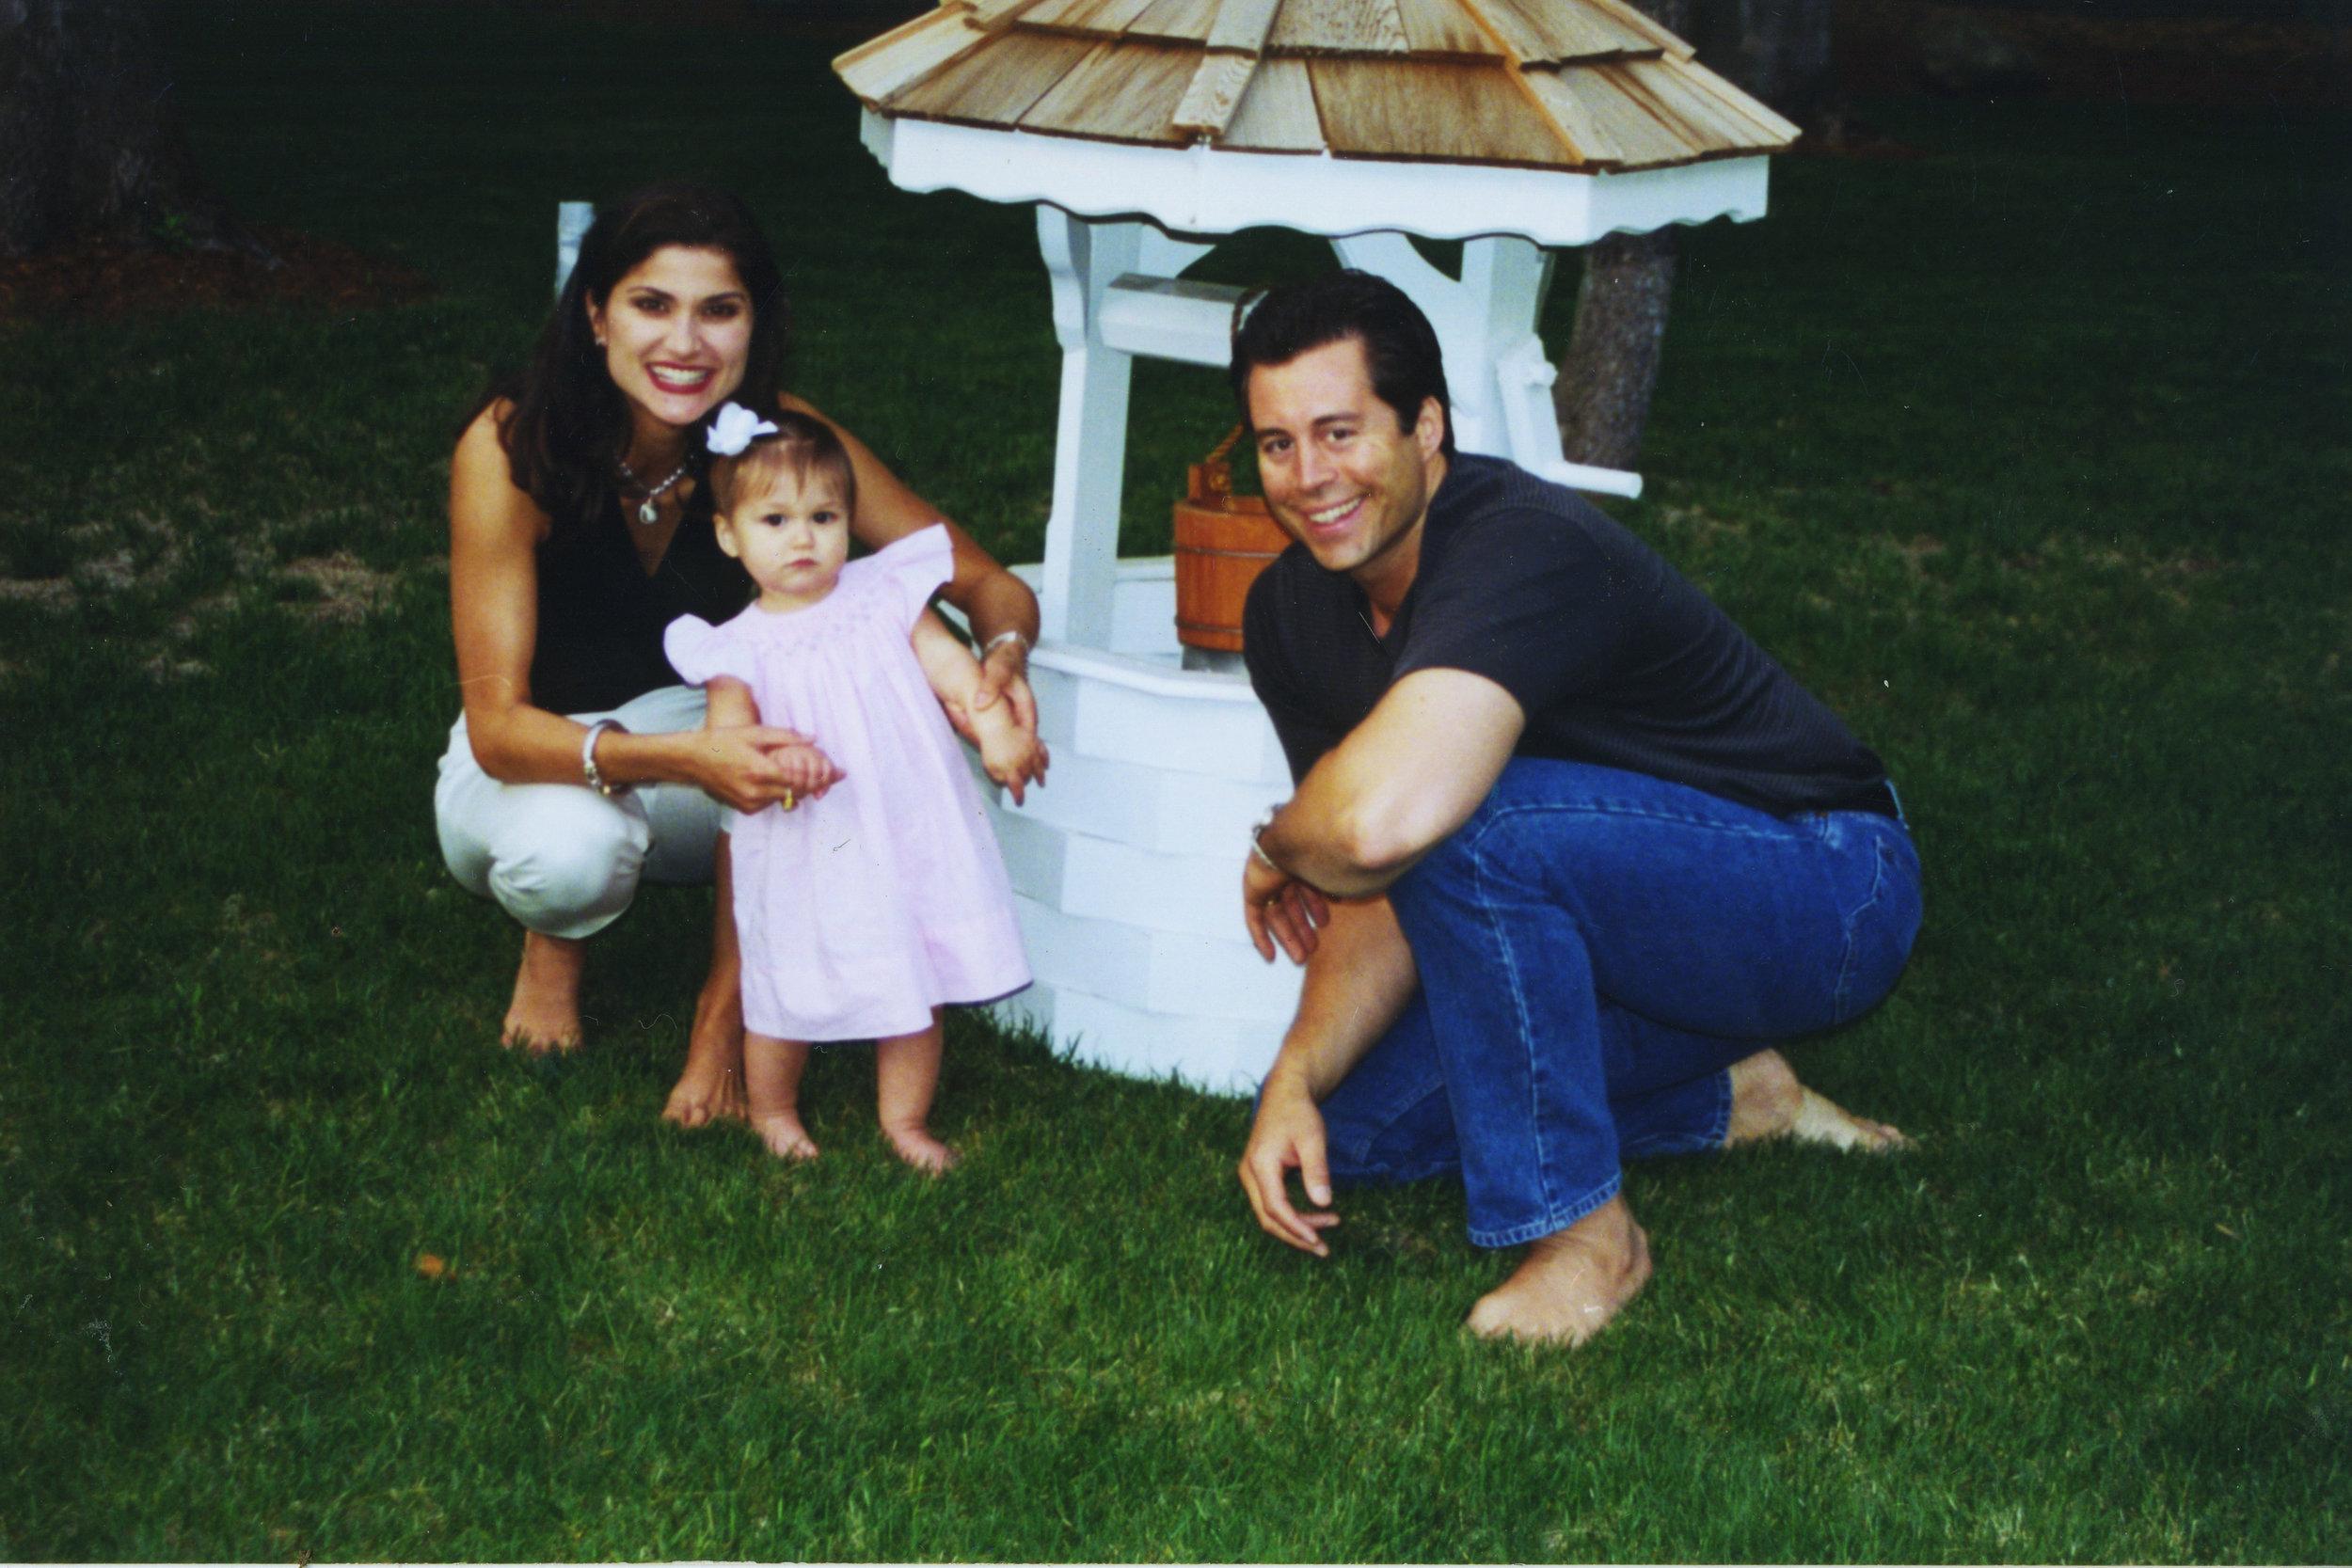 Steve, Shelly and Jacqueline Genovese enjoying family time.